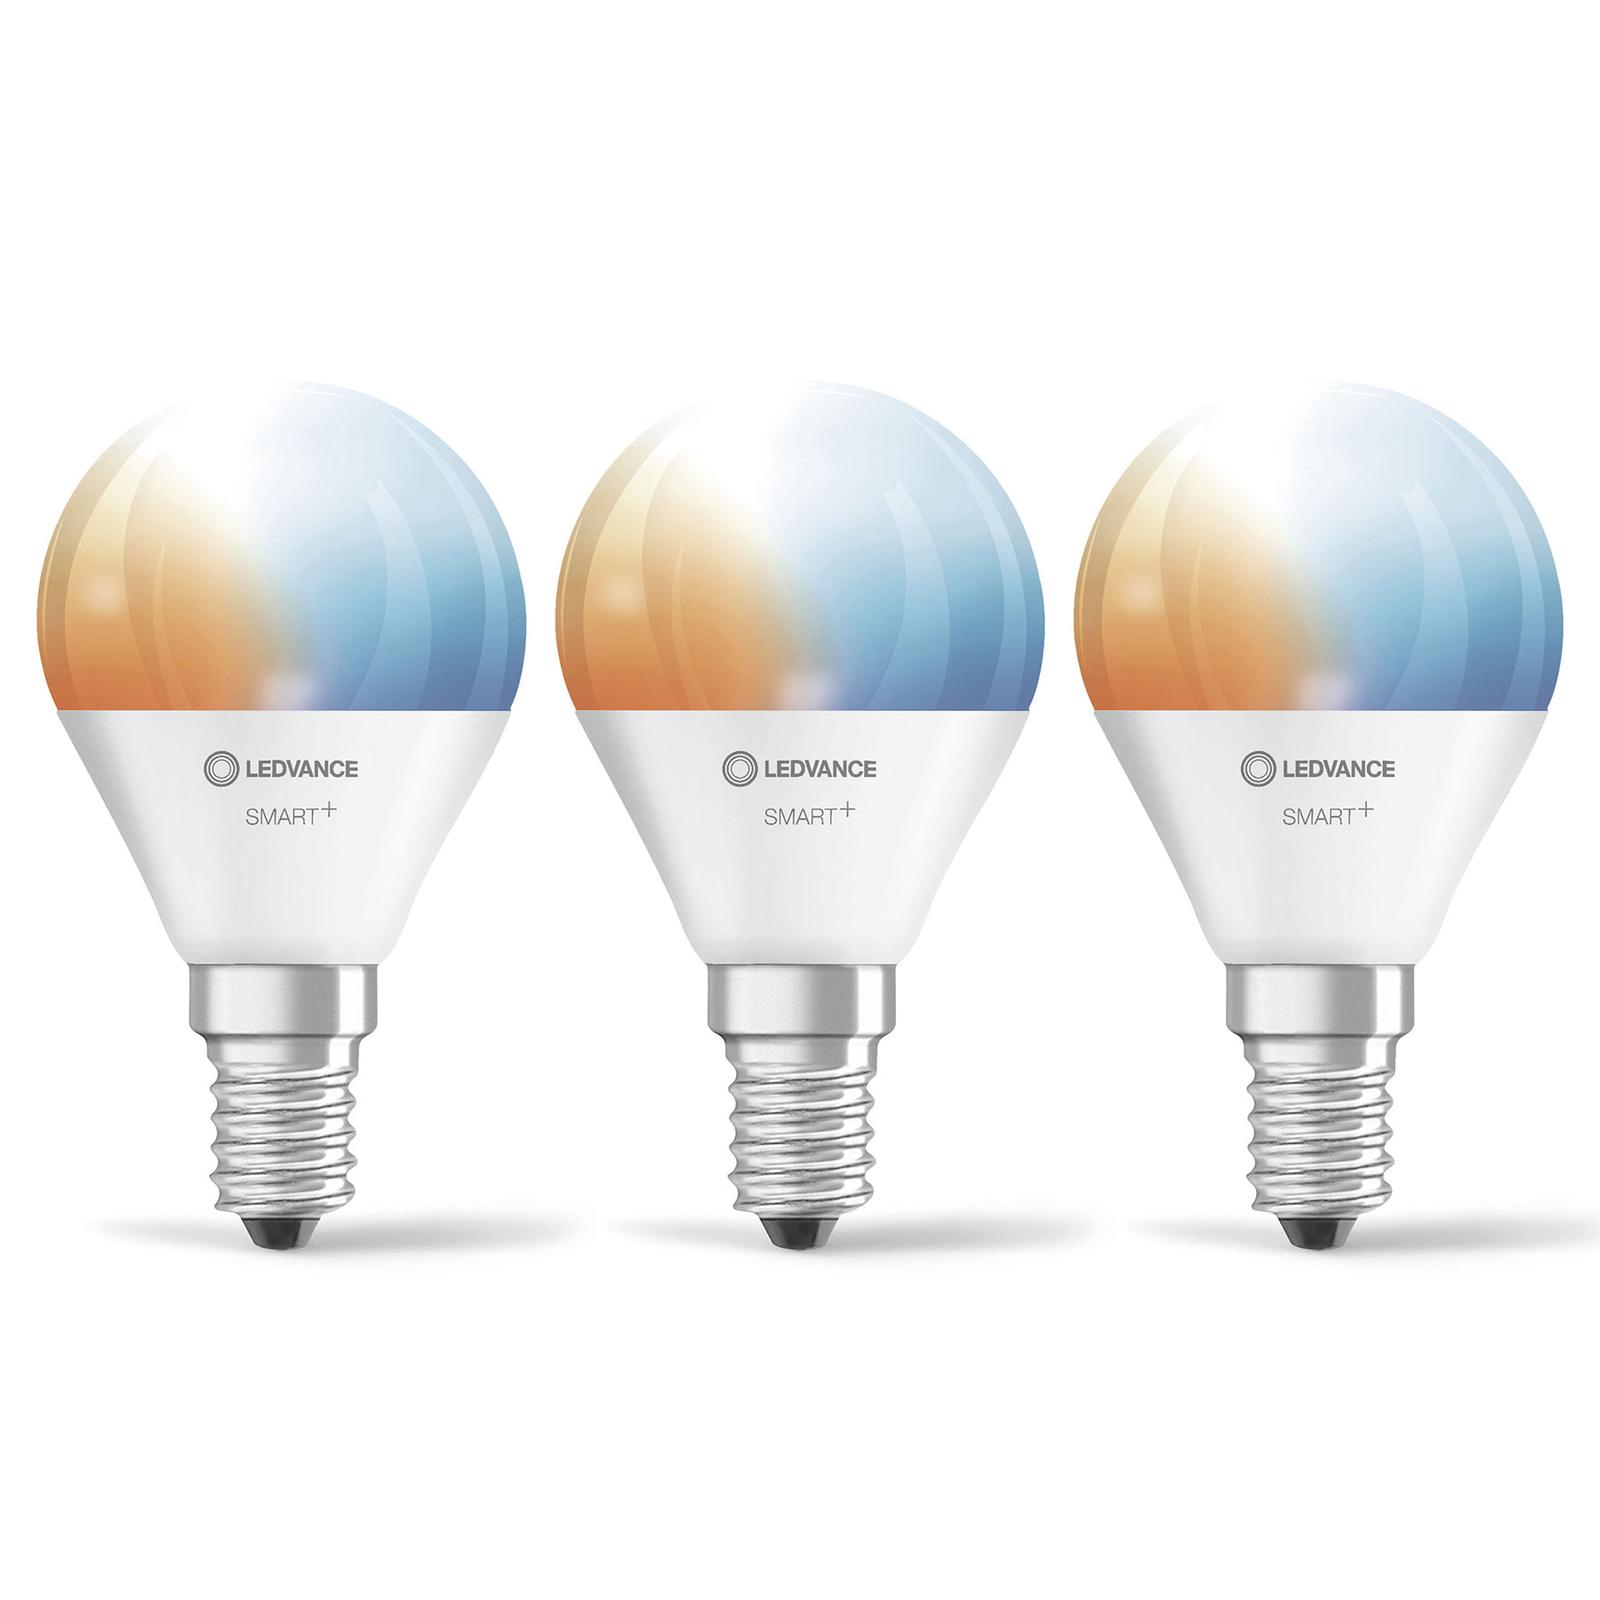 LEDVANCE SMART+ WiFi E14 5W golf ball CCT 3-pack_6106417_1